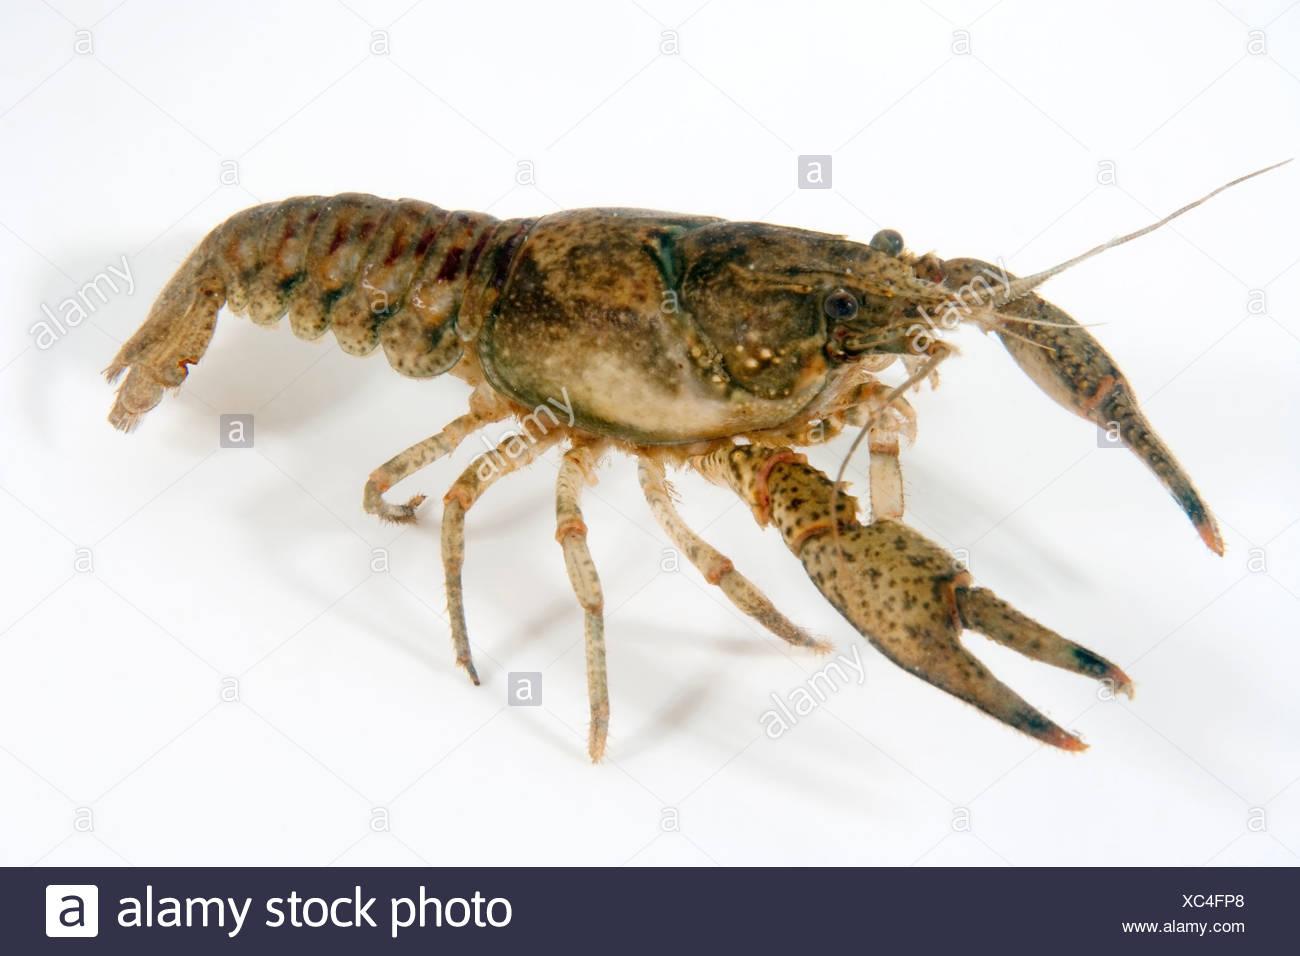 North American Crayfish, Orconectes limosus, Lake Lugano, Ticino, Switzerland - Stock Image